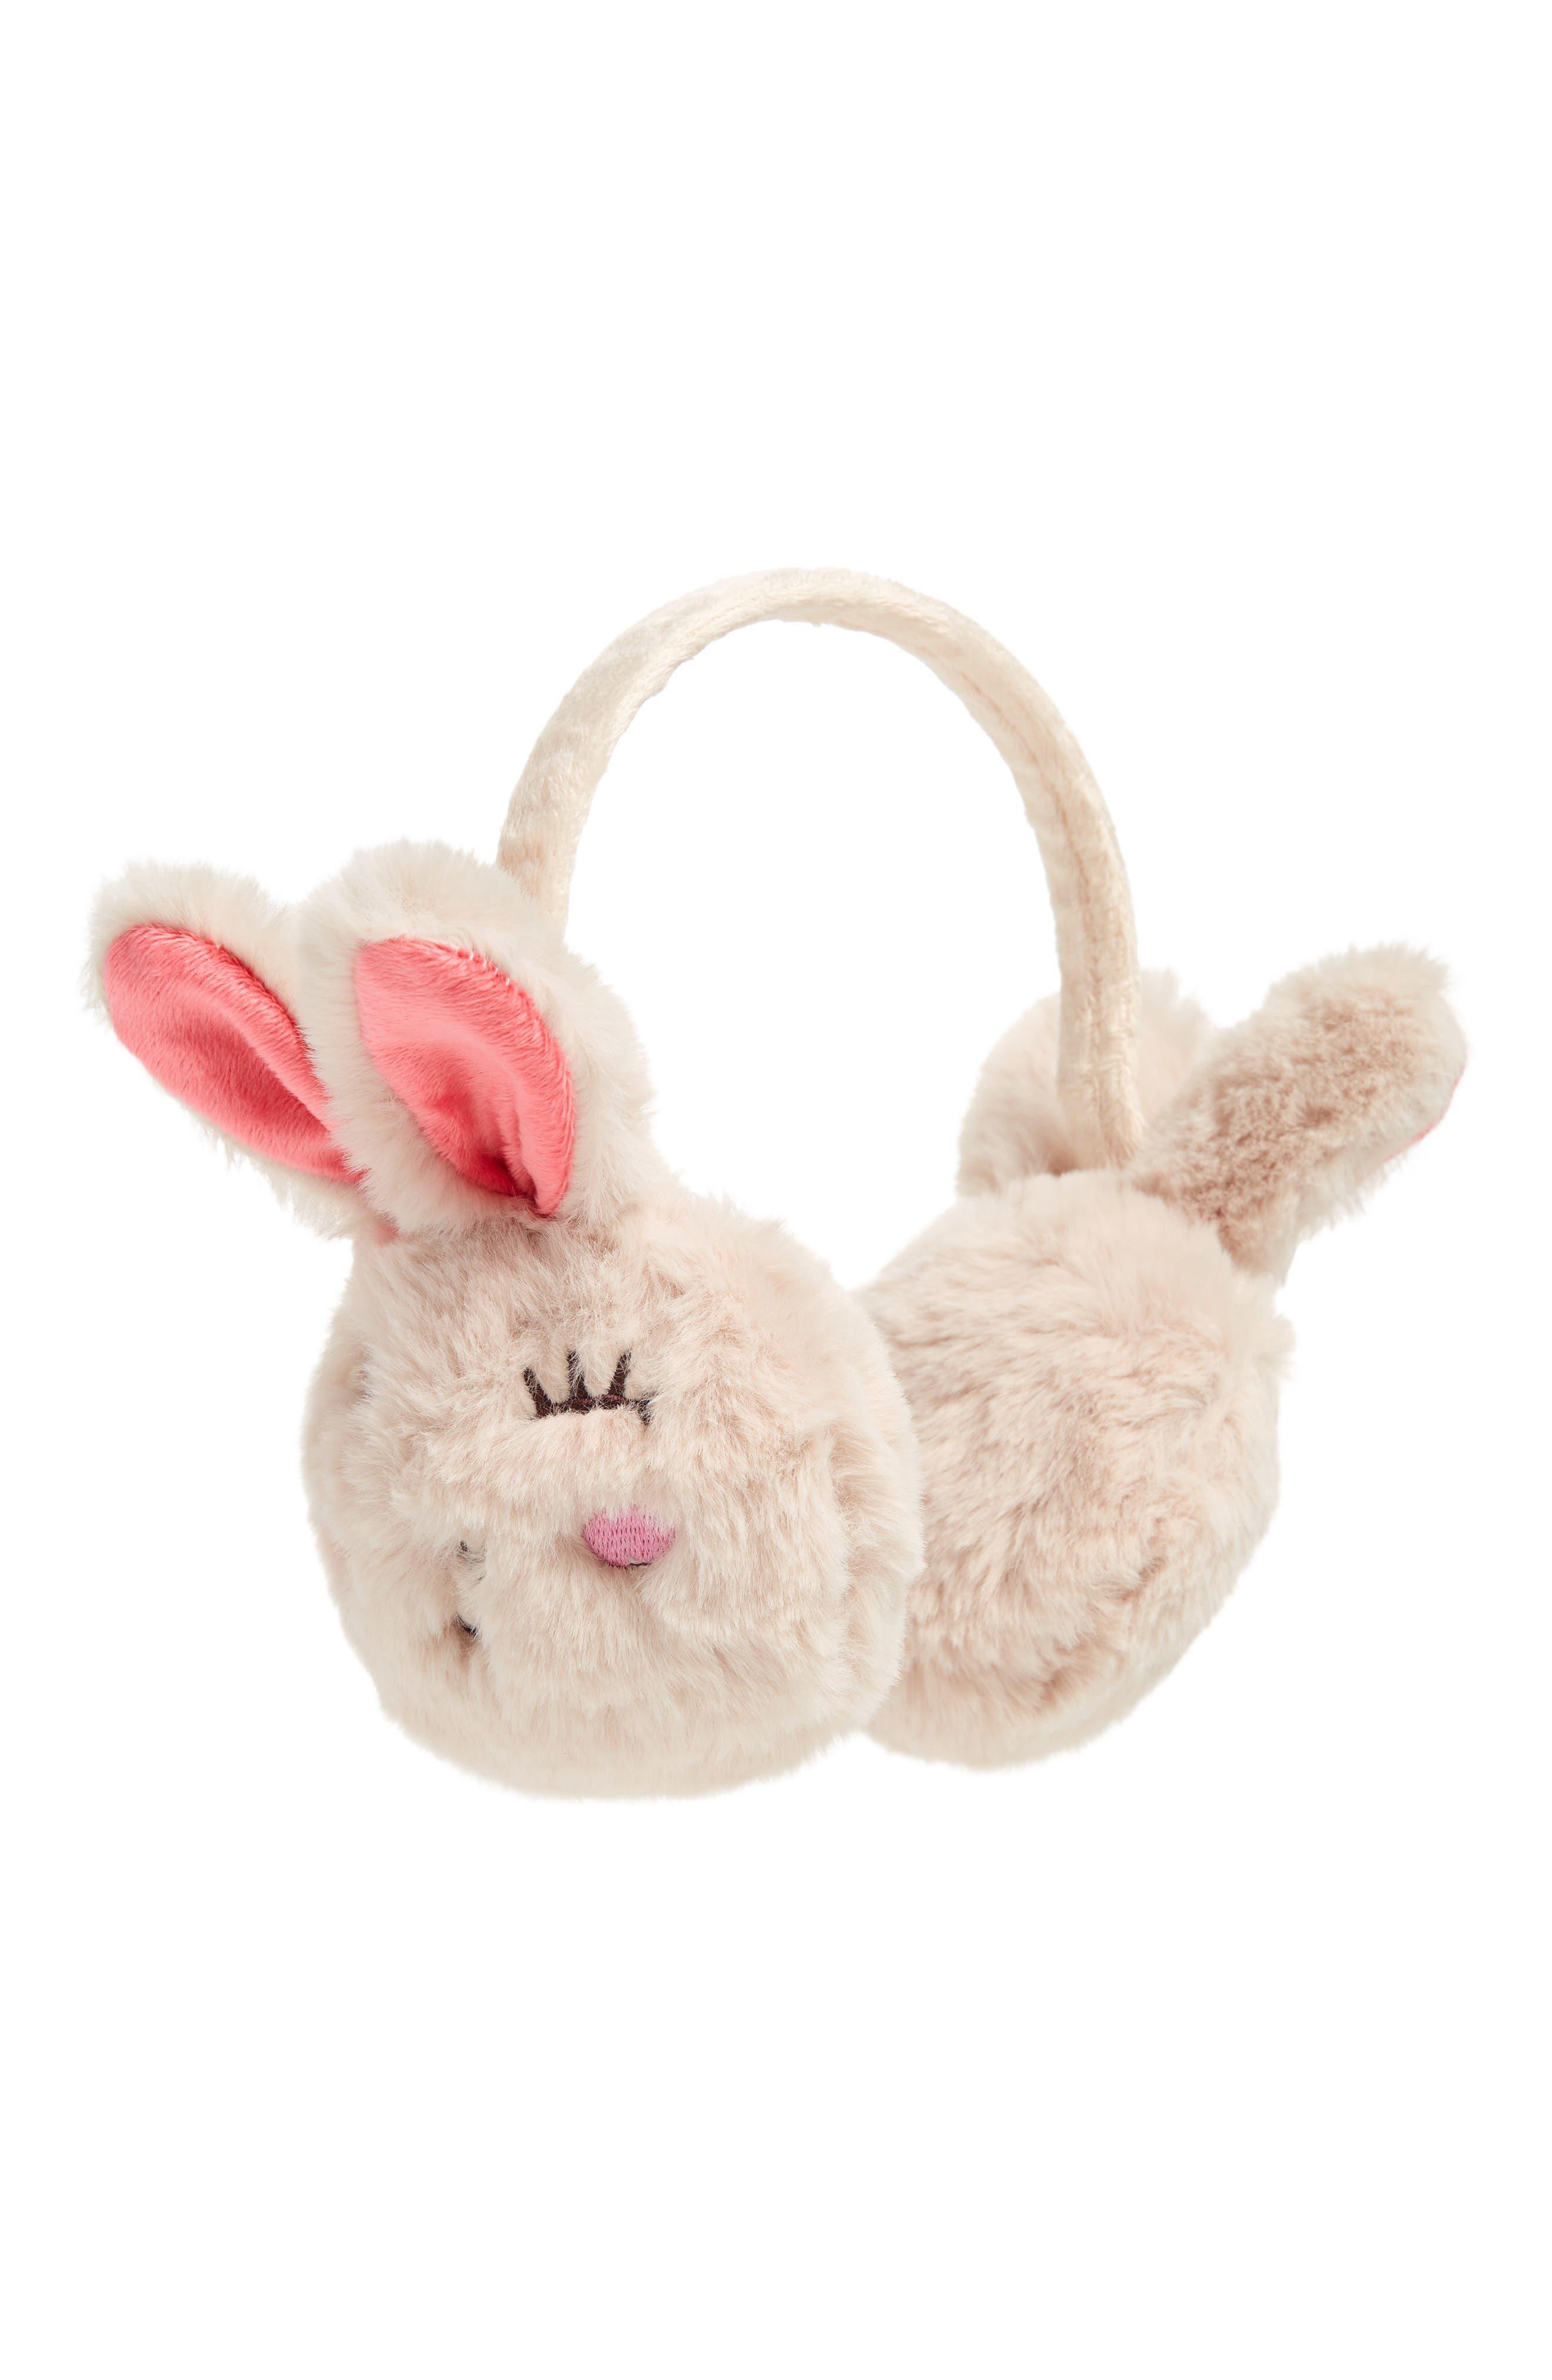 TUCKER + TATE Faux Fur Bunny Earmuffs, Main, color, 050